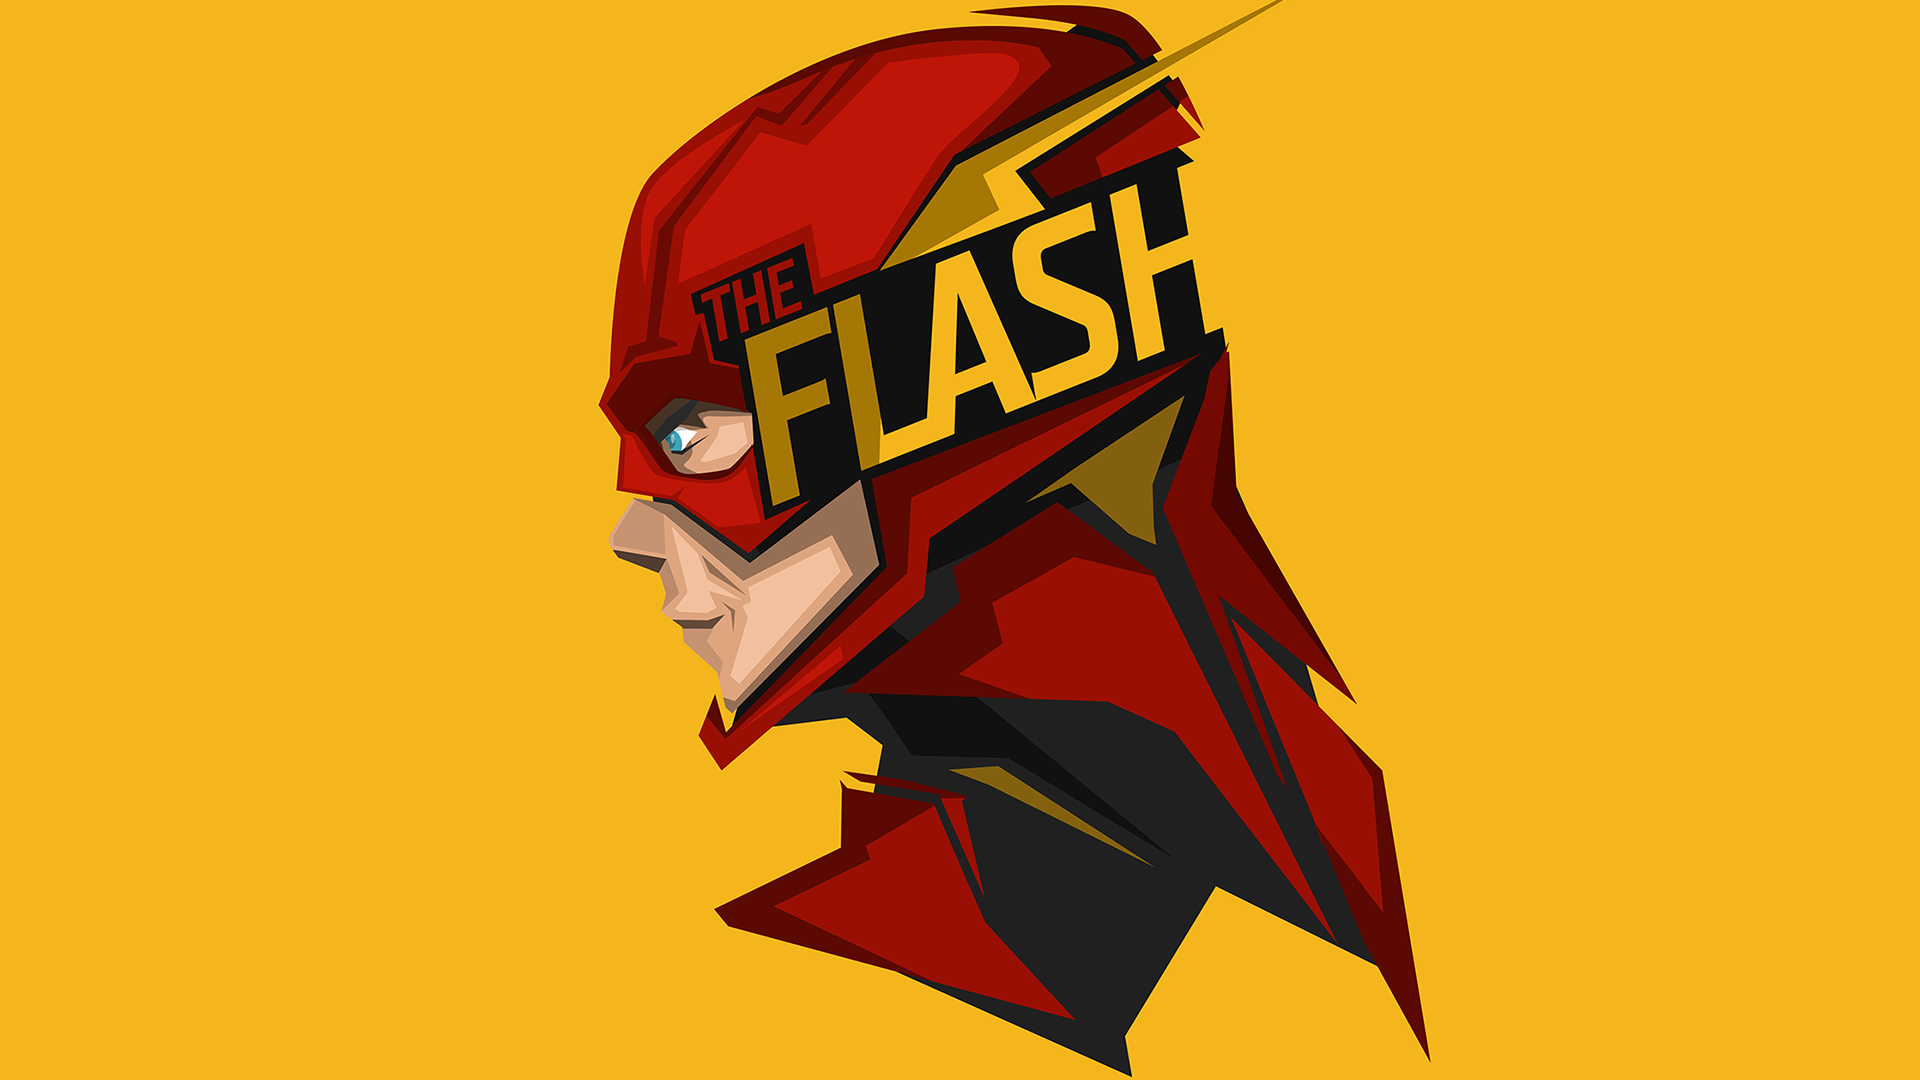 The flash abstract art hd superheroes 4k wallpapers - Flash wallpaper hd 1080p ...